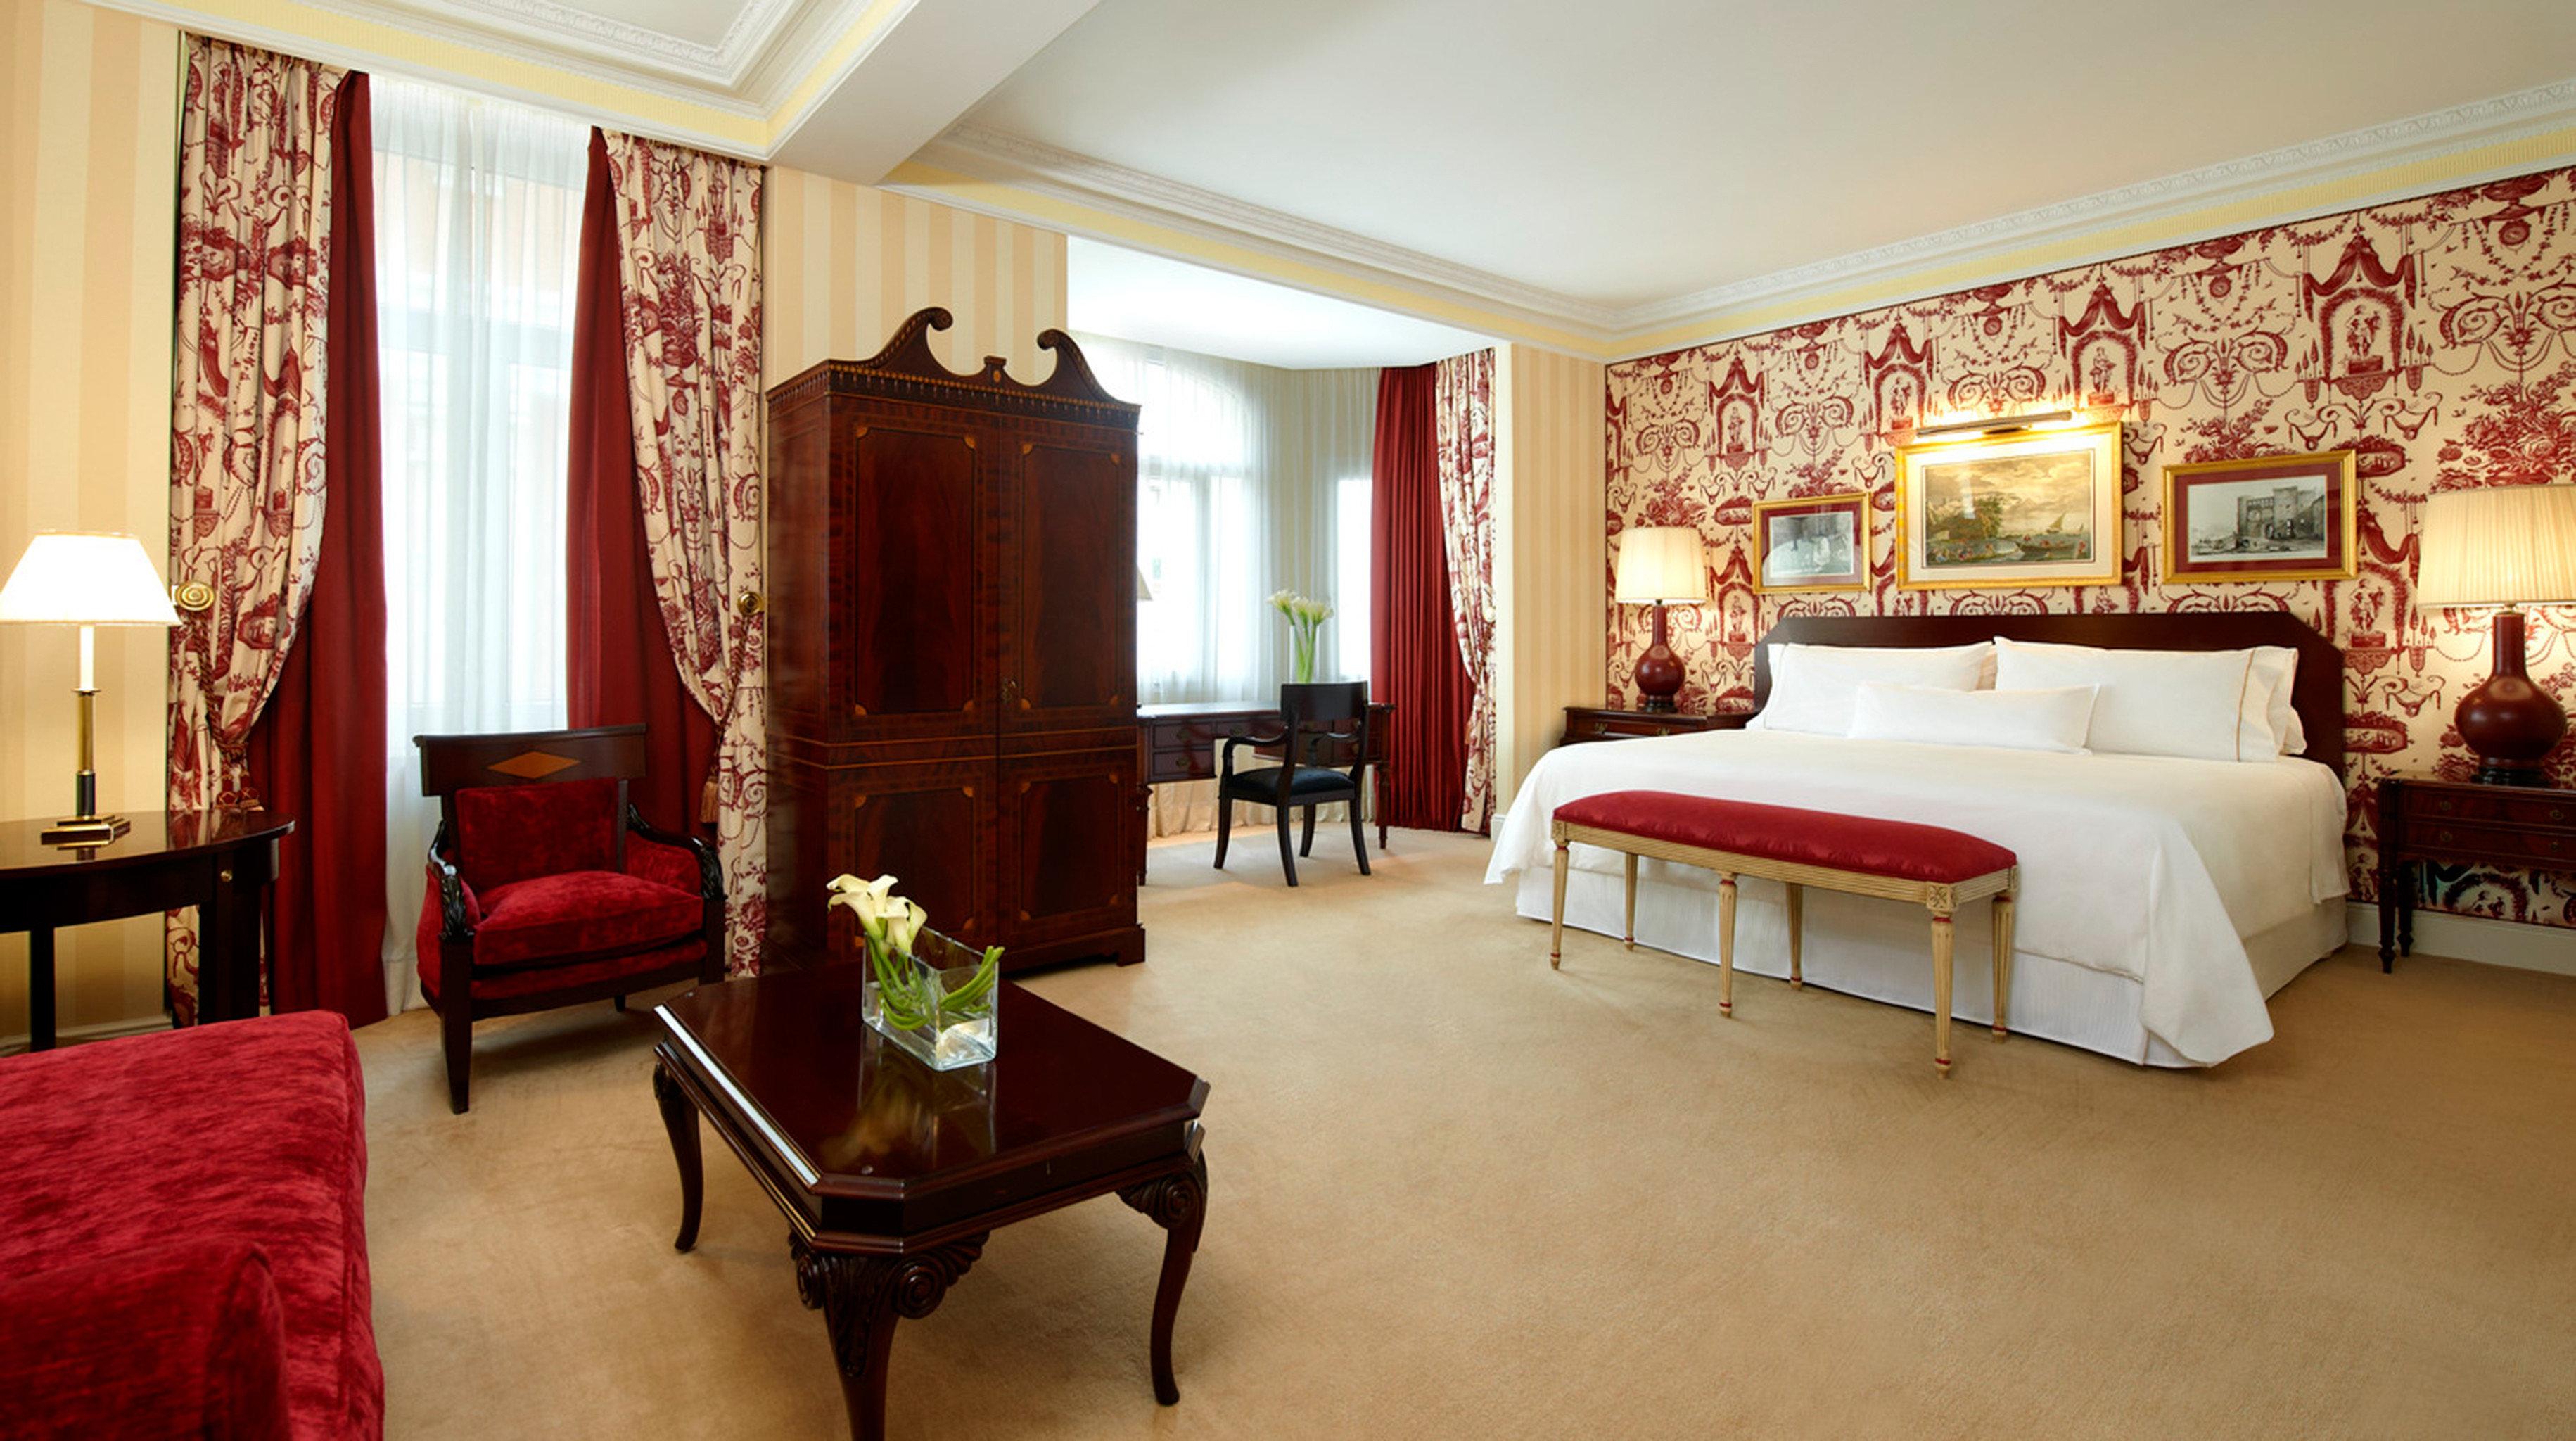 Bedroom Historic Hotels Lounge Madrid Rustic Spain Suite property living room home hardwood Villa